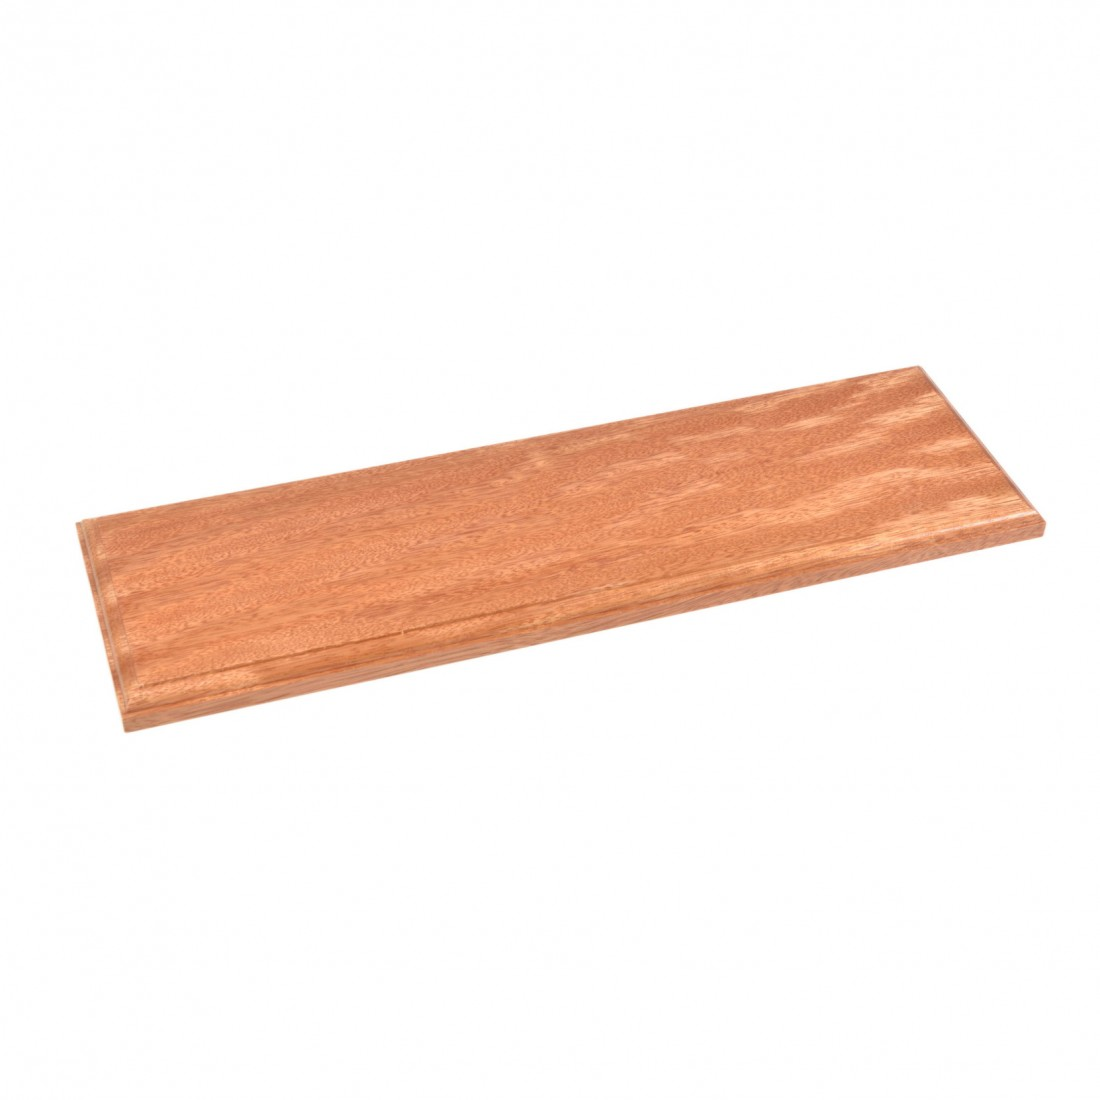 Wooden varnished baseboards cm.50x15x2